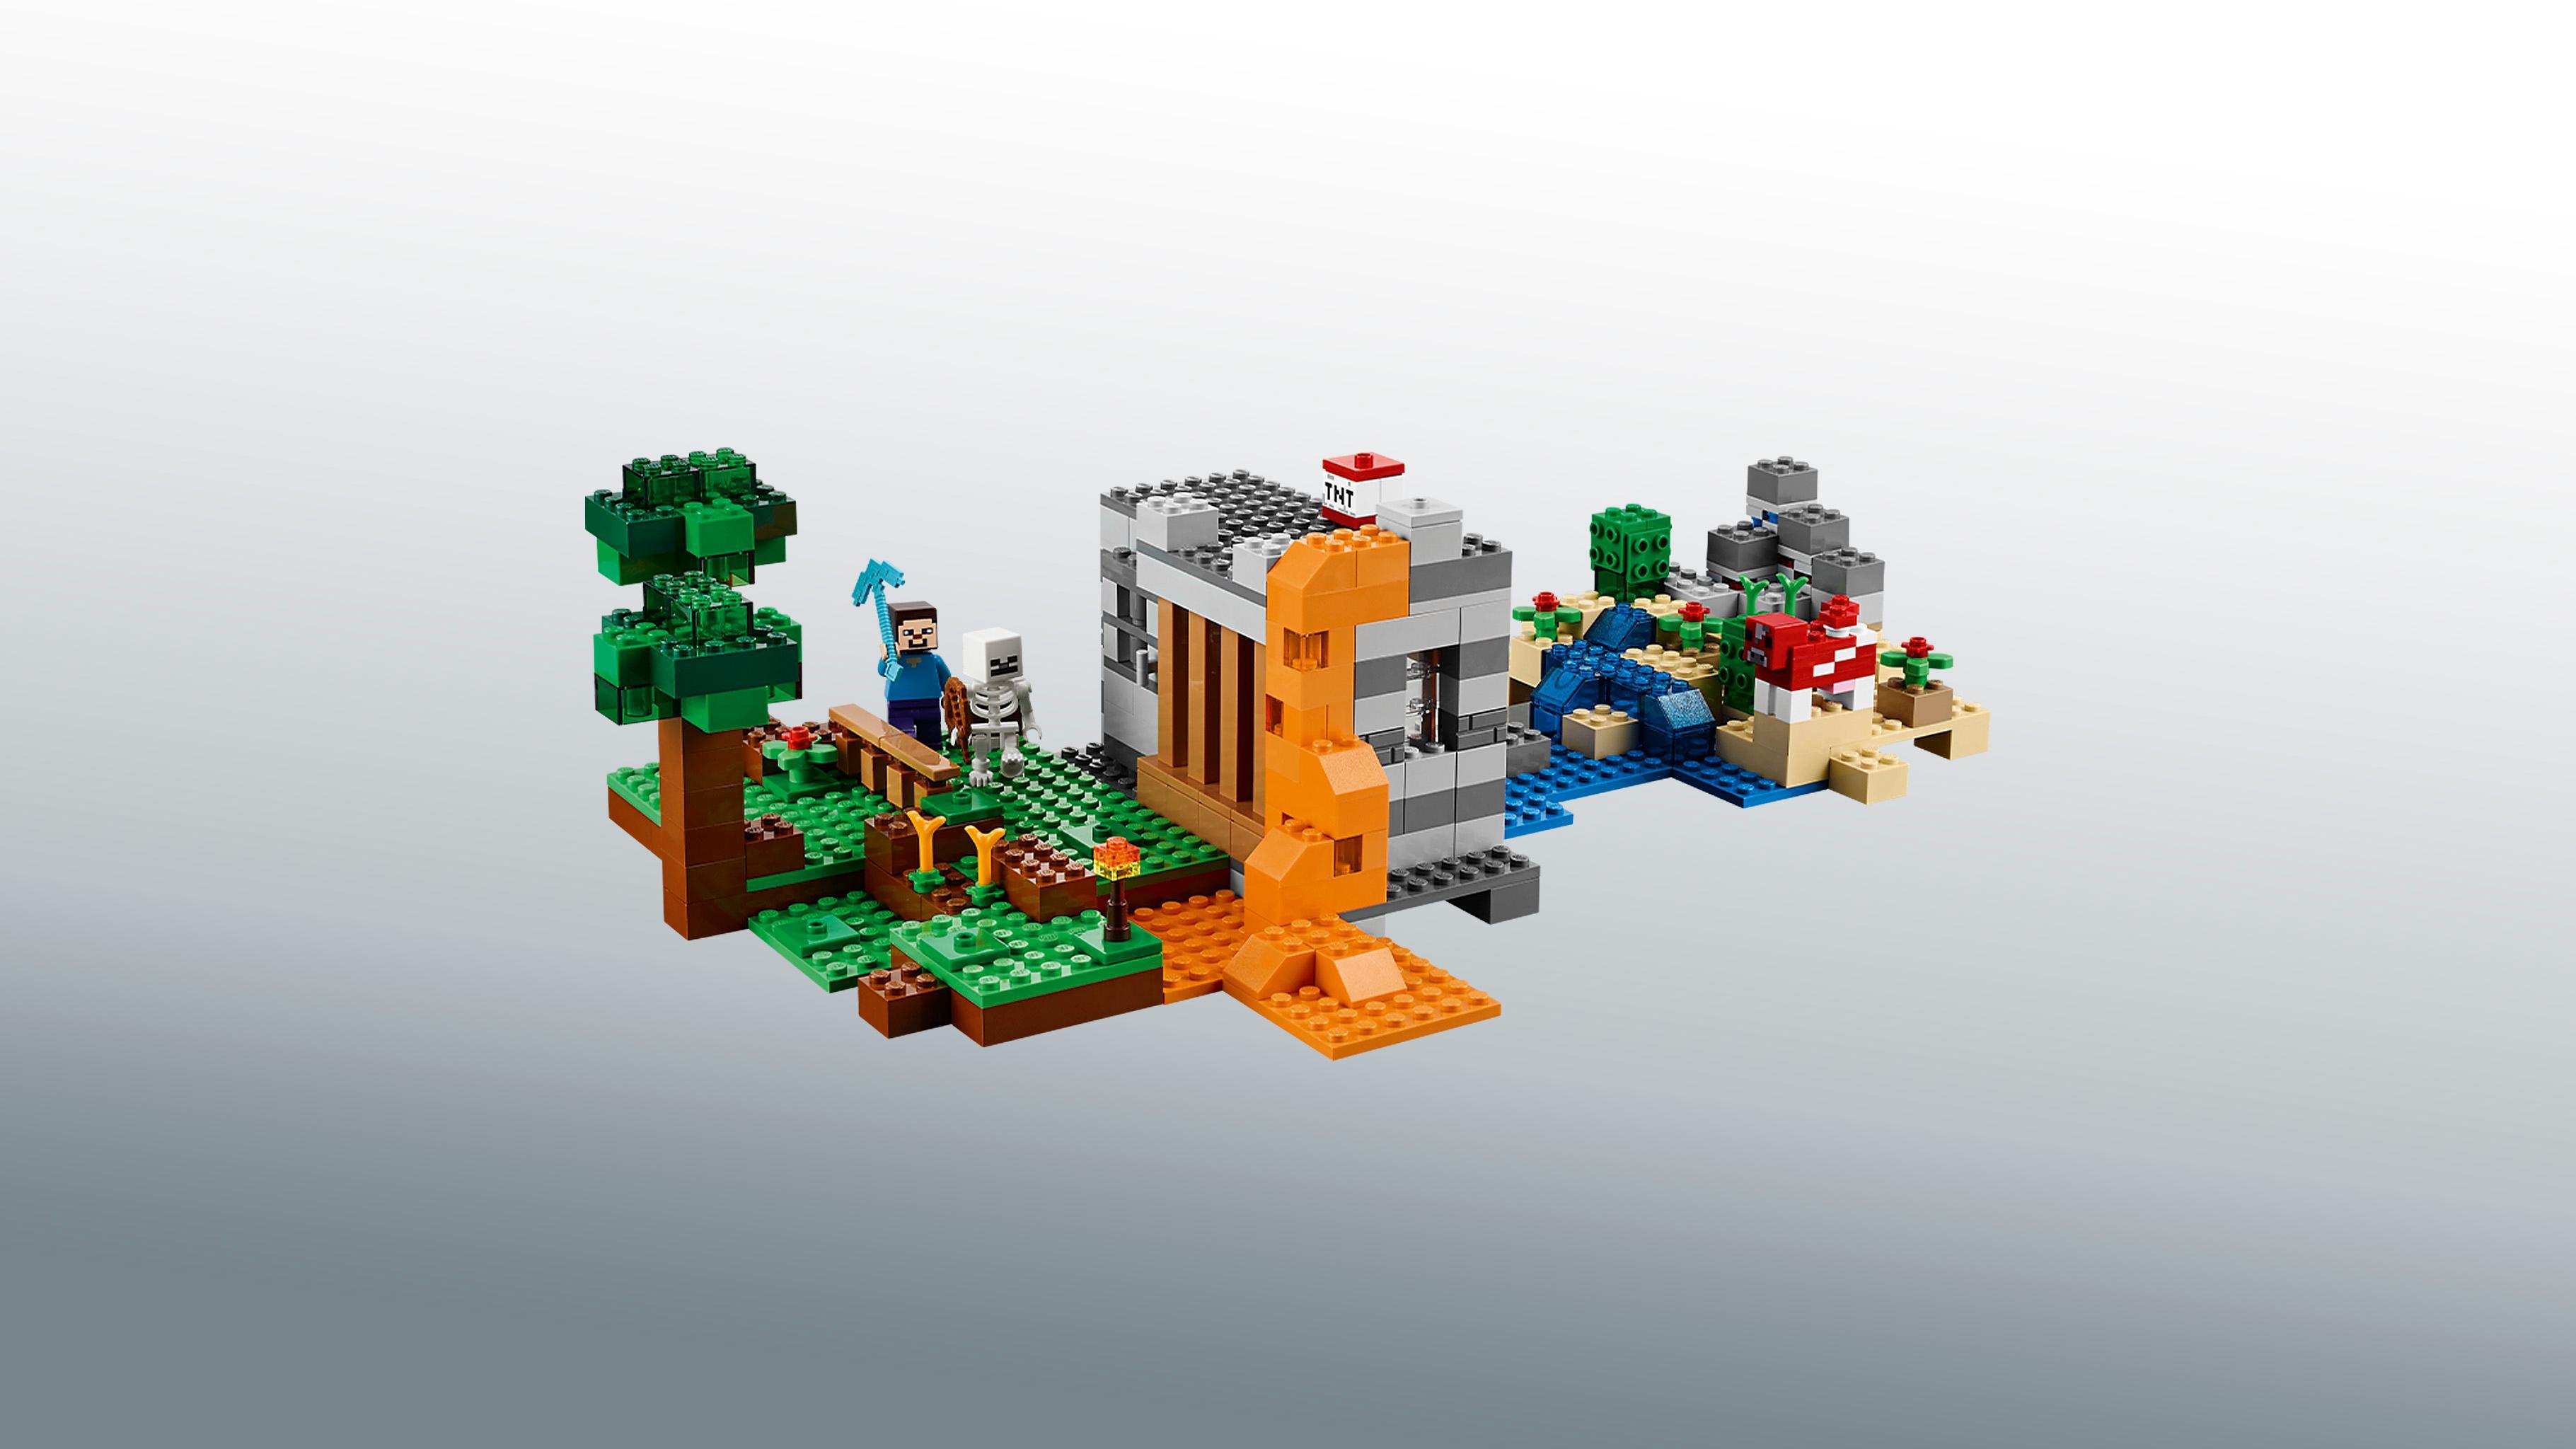 Amazon.com: LEGO Minecraft 21116 Crafting Box: Toys & Games